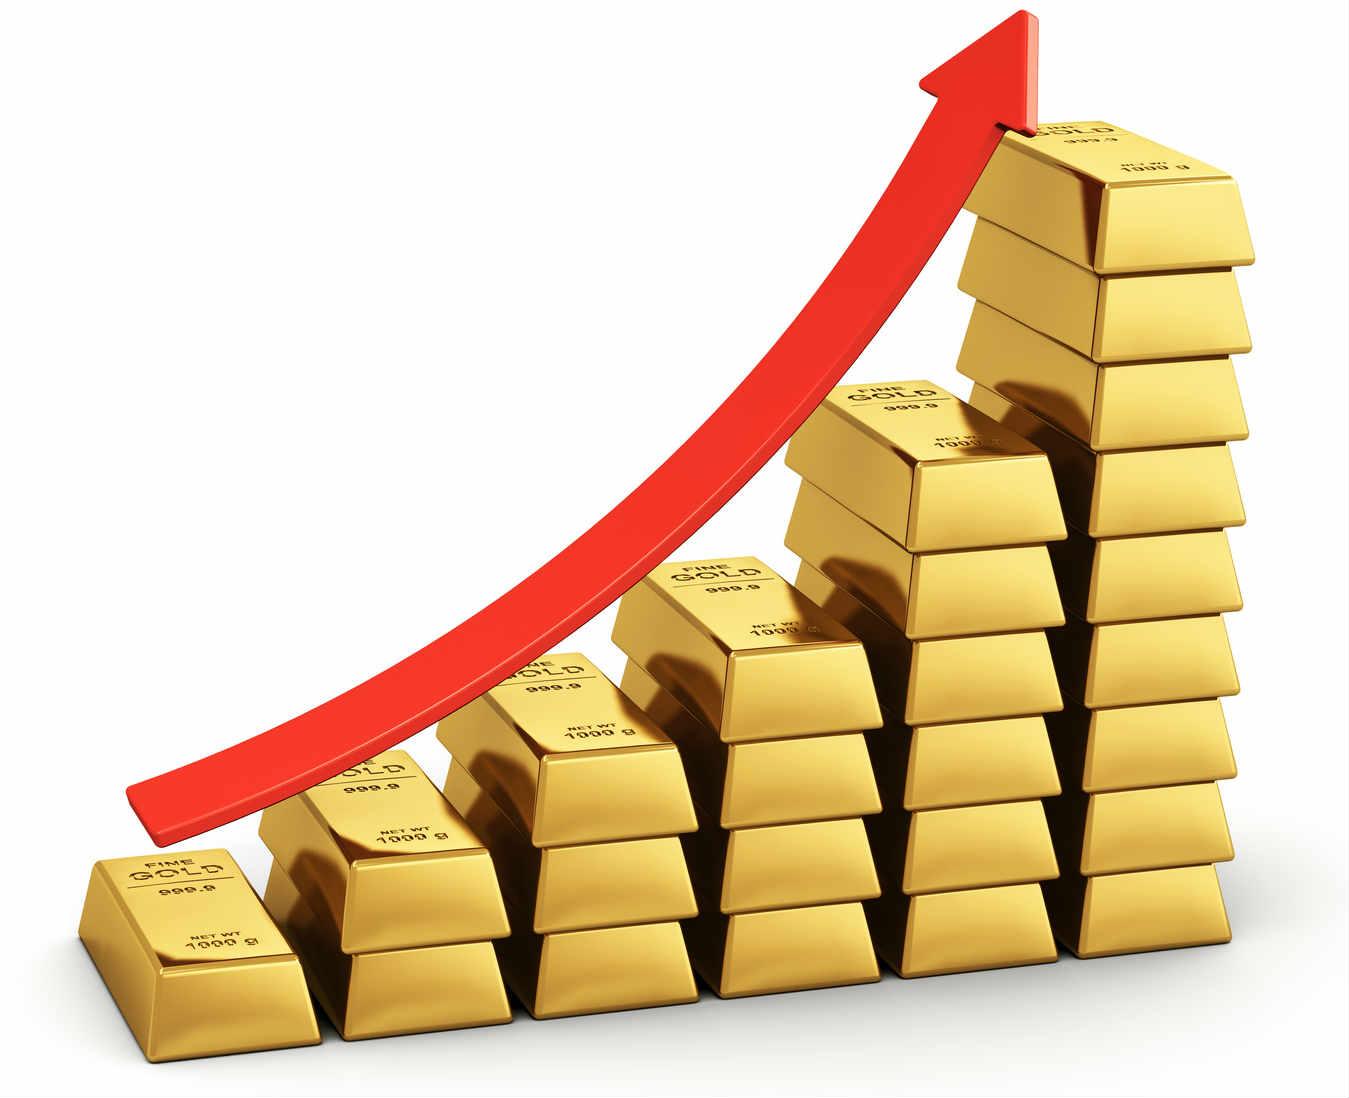 Сезонная динамика цен на золото: факторы влияния